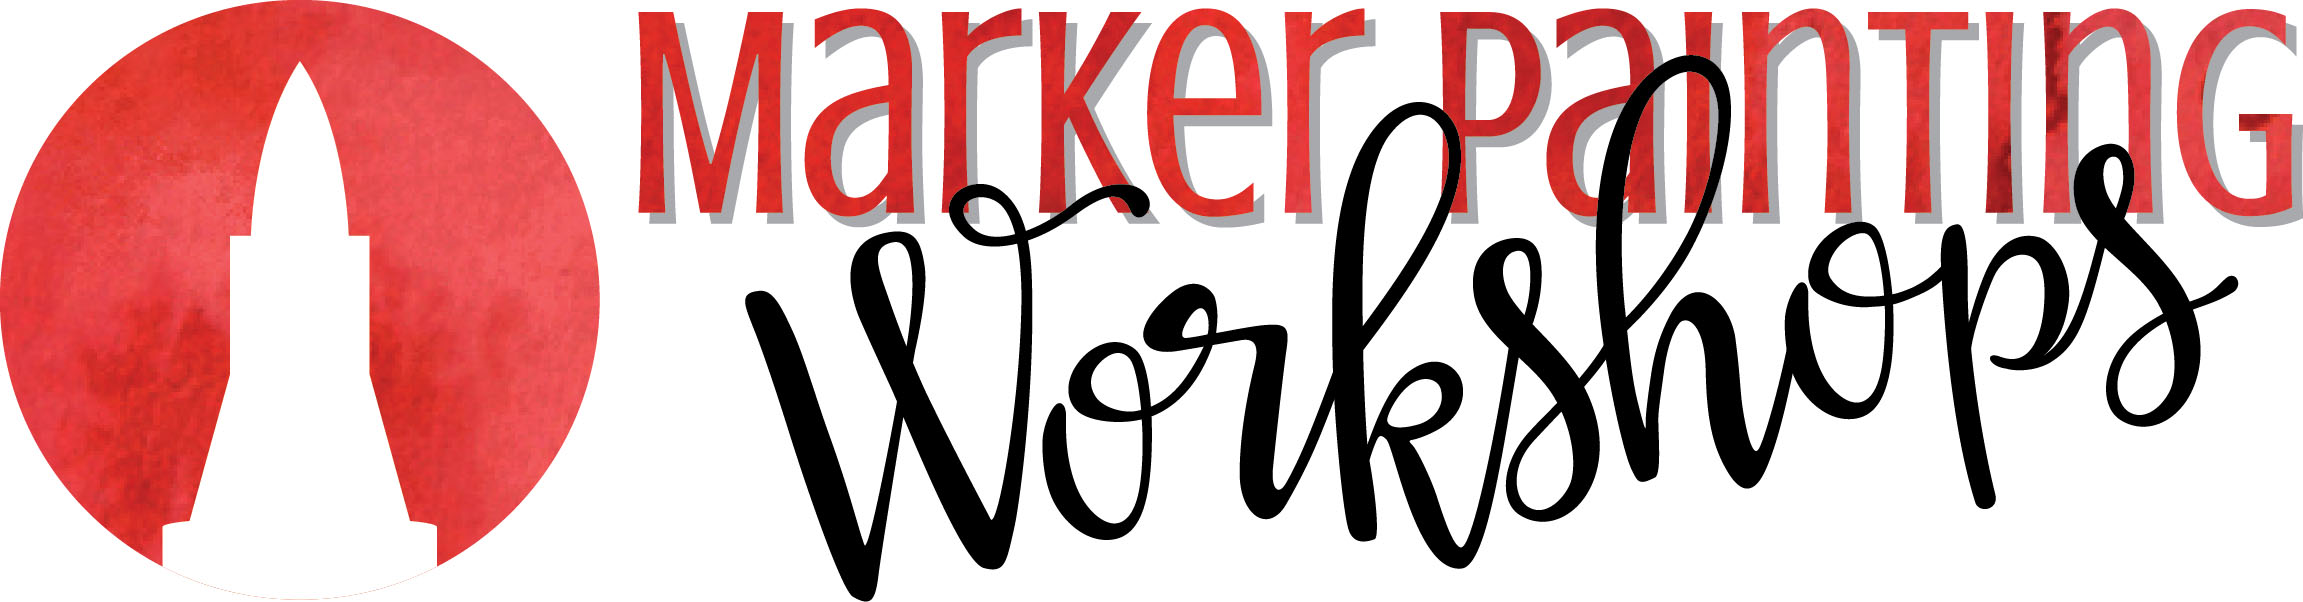 Marker Painting Workshop Logo copy.jpg